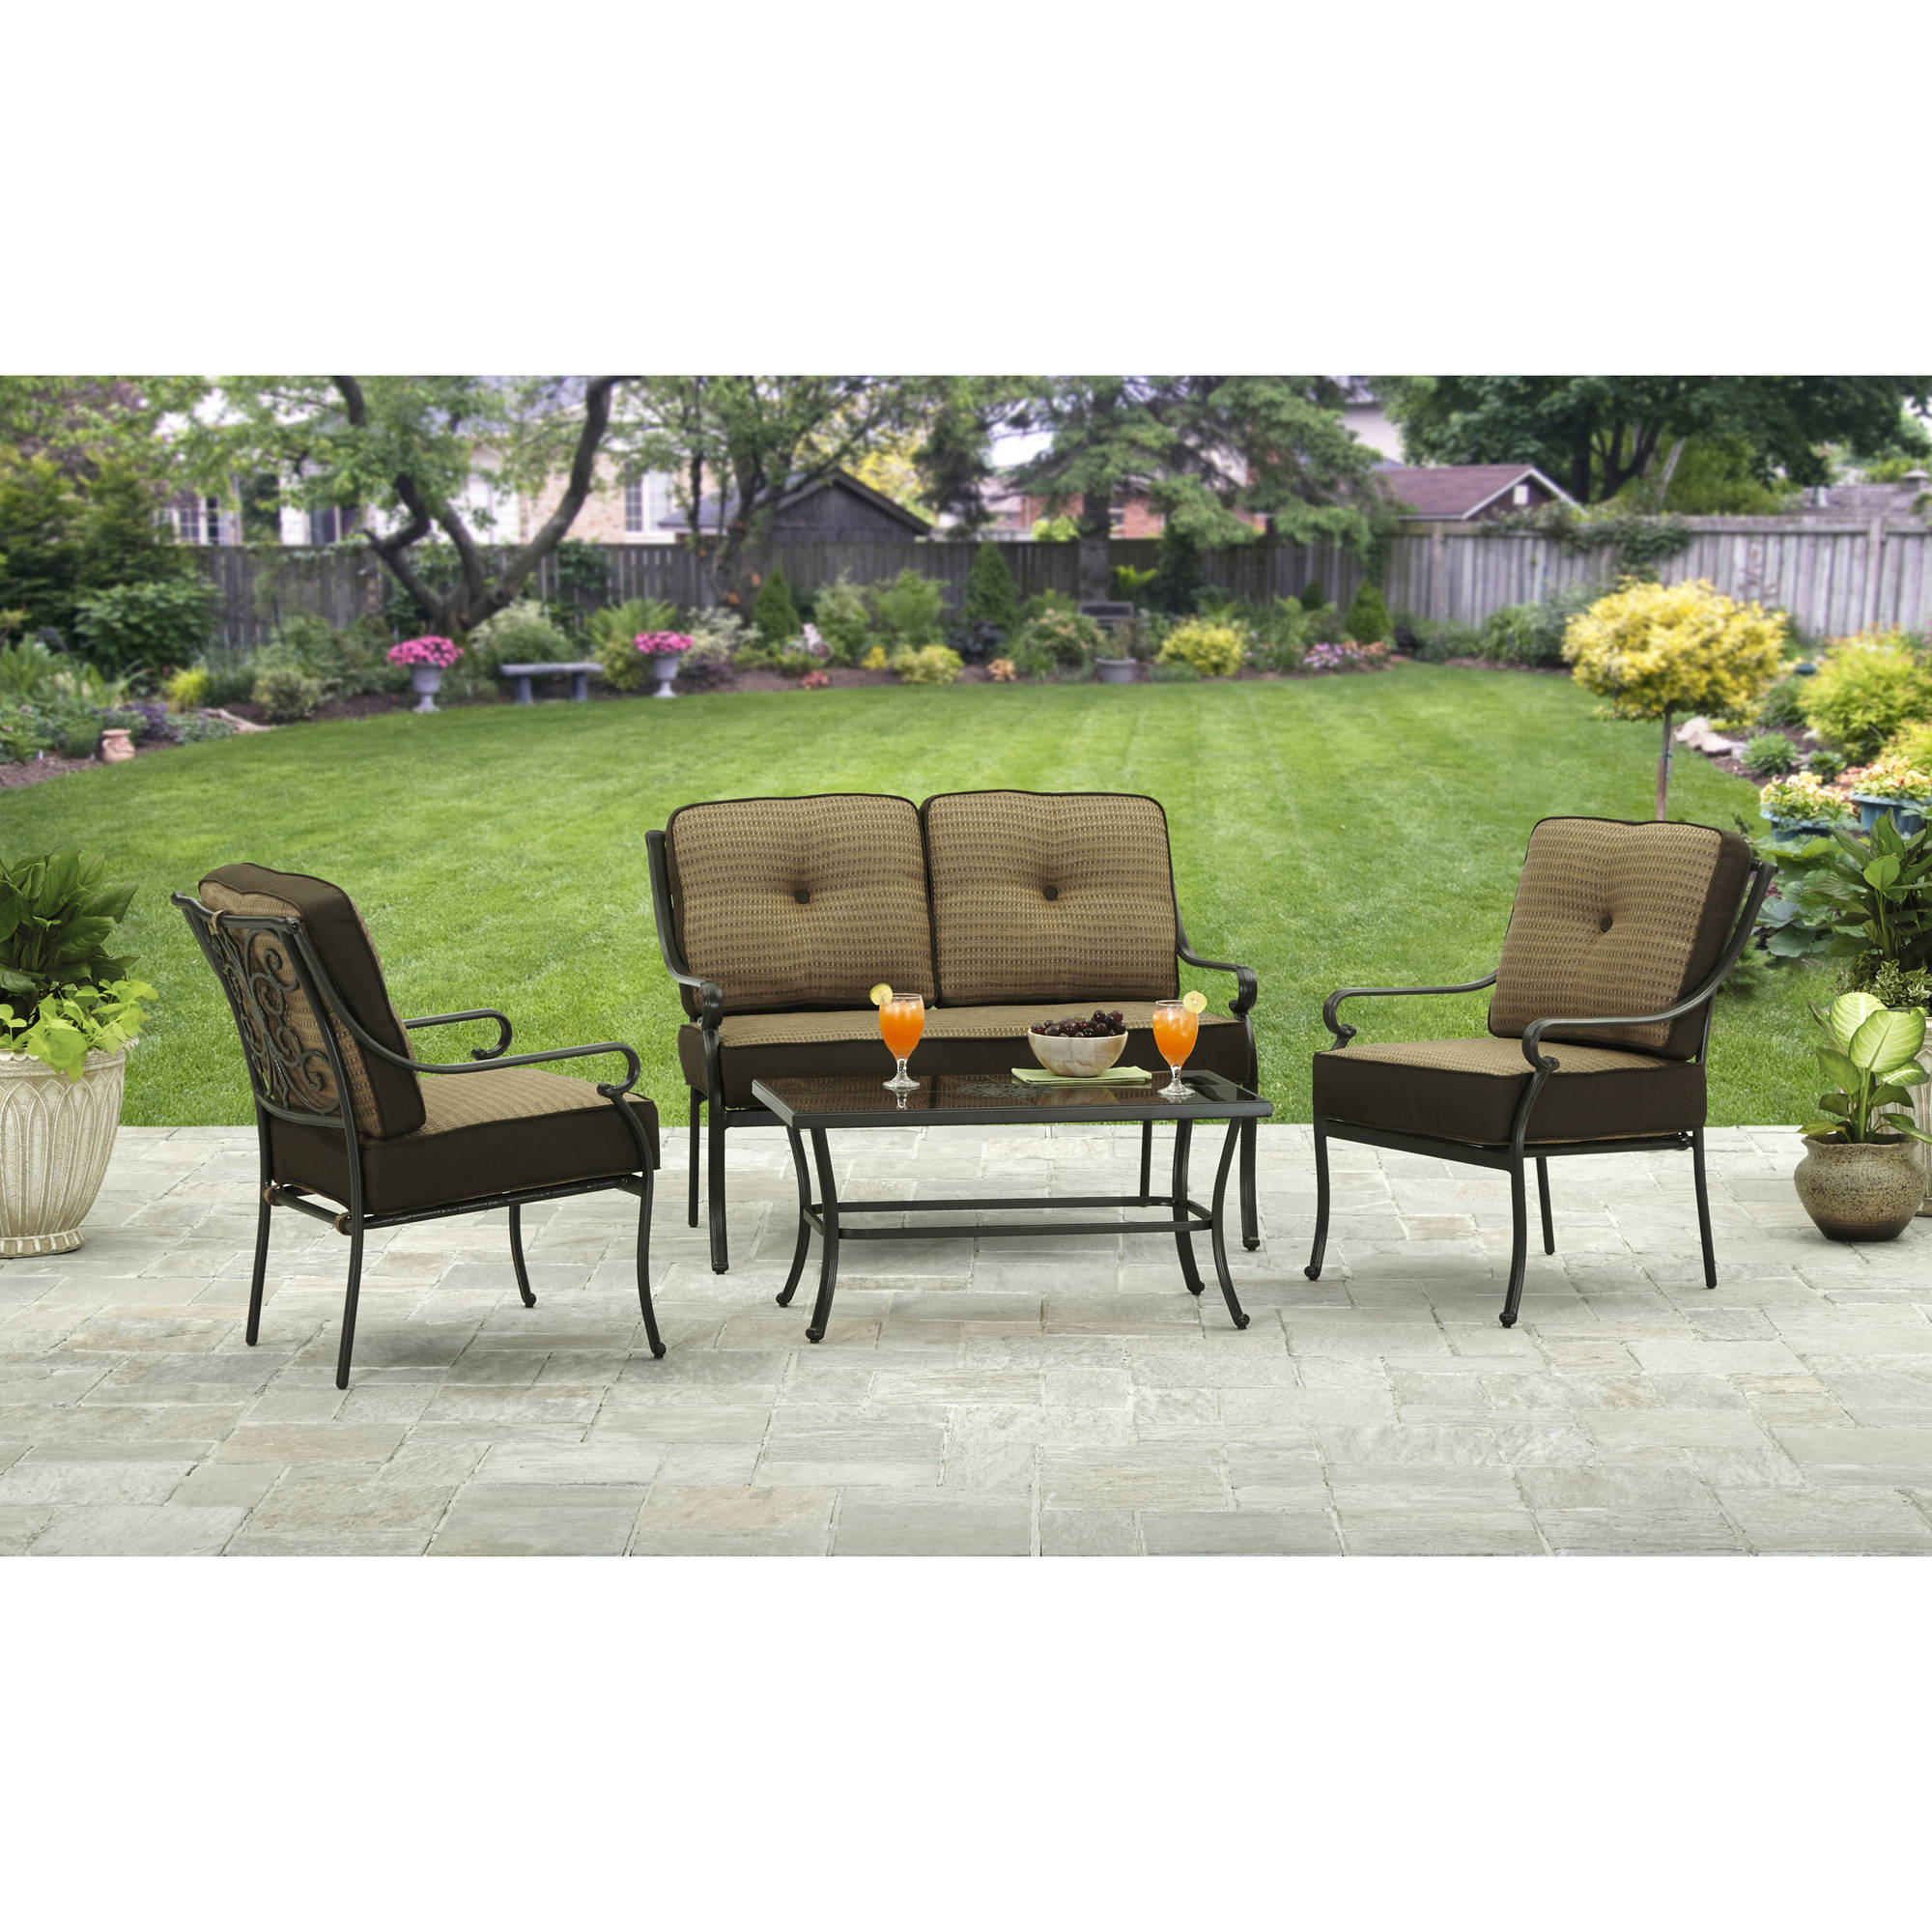 Better Homes and Gardens Bailey Ridge 4 Piece Outdoor Conversation Set